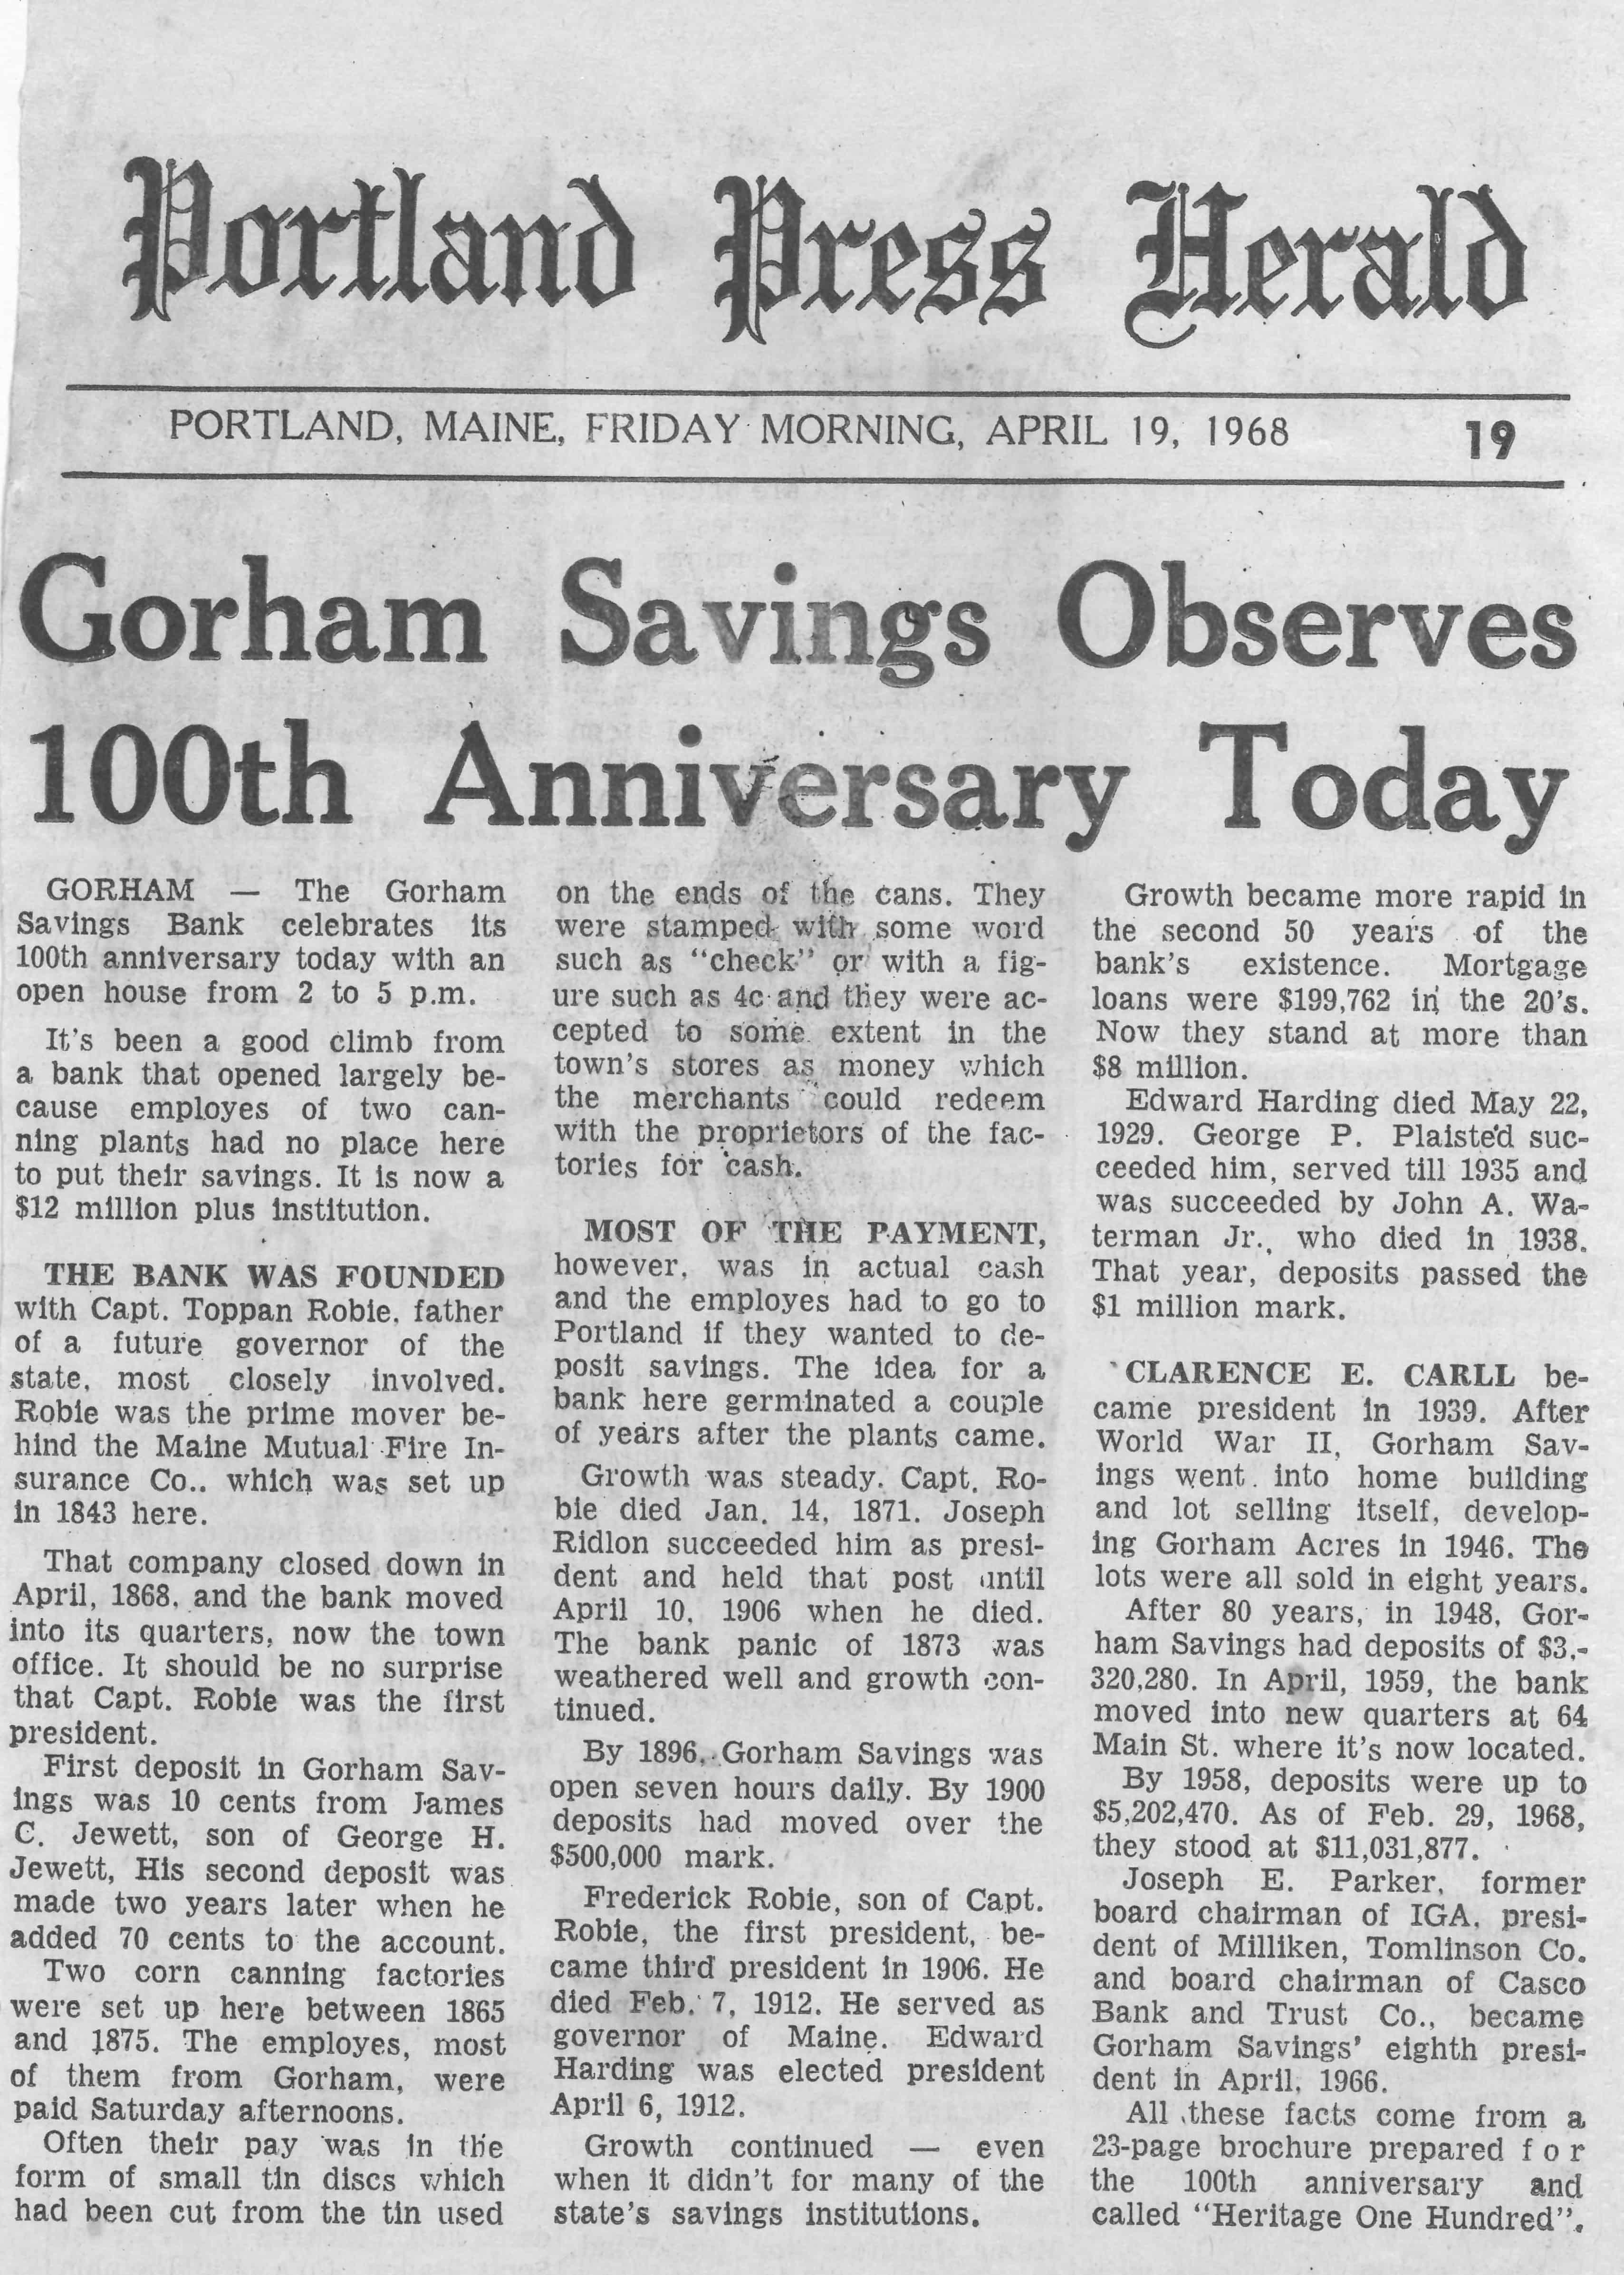 Gorham Savings Bank Celebrates 100 year anniversary